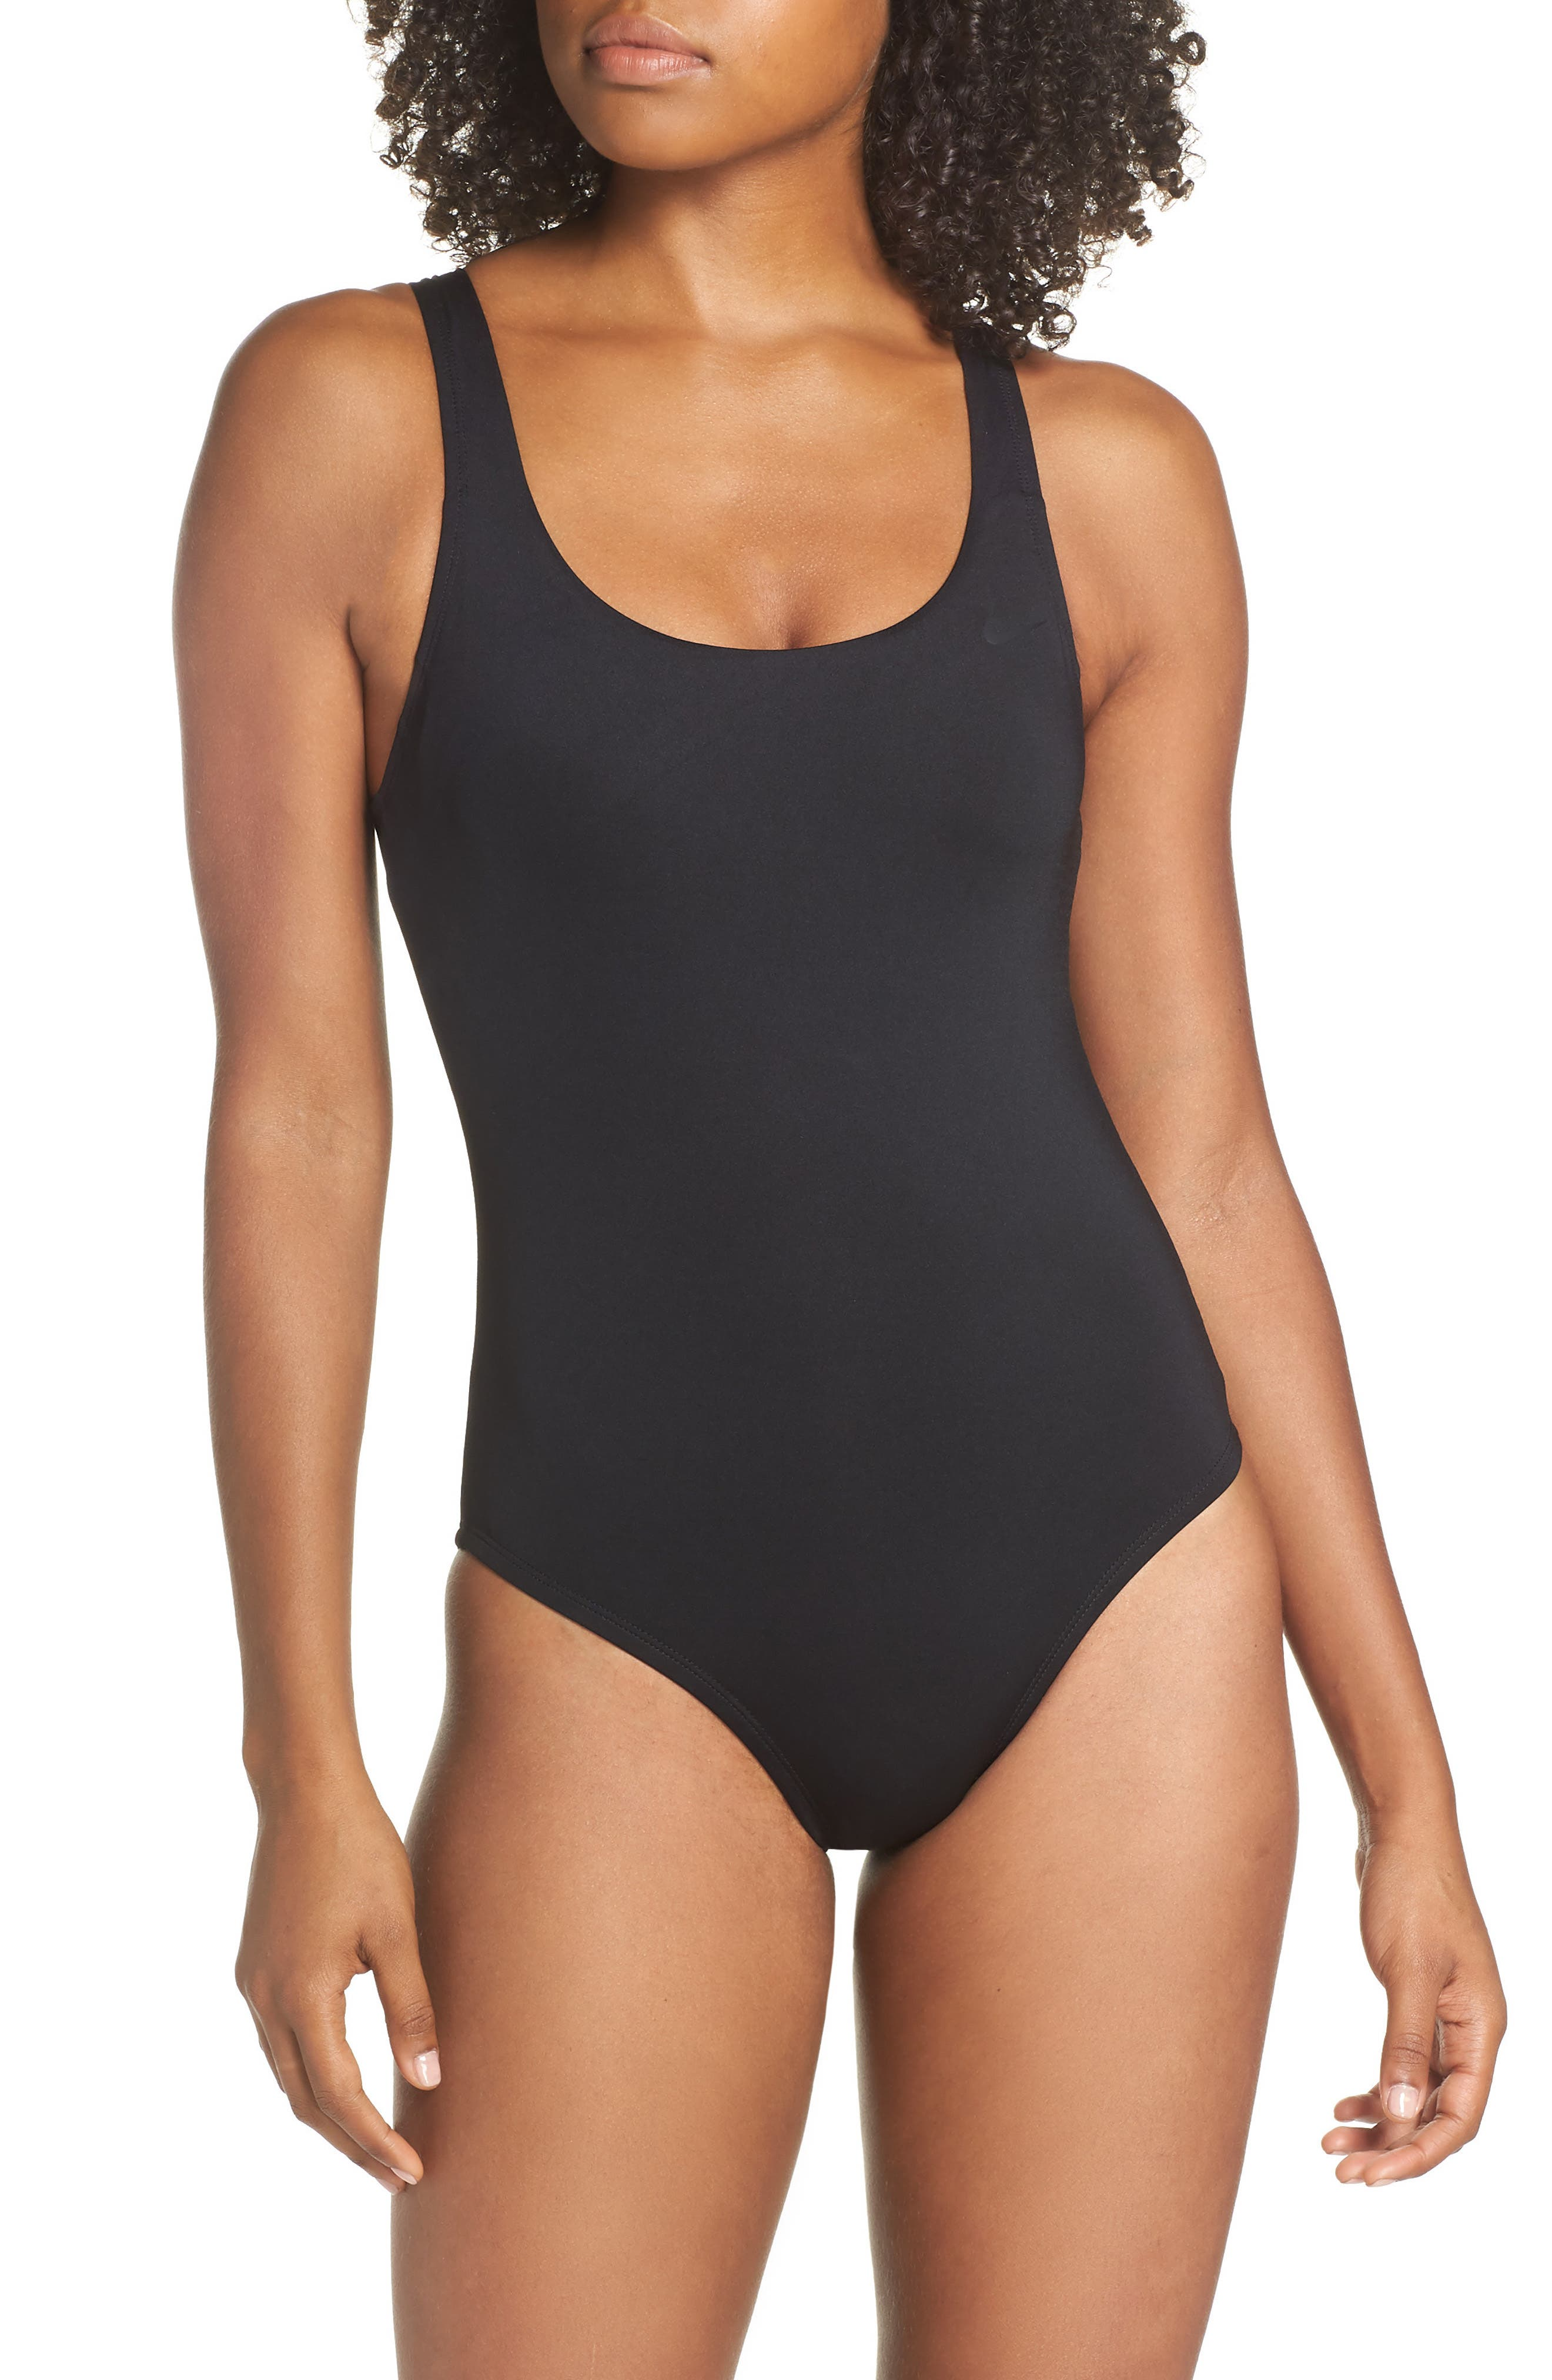 NIKE U-Back One-Piece Swimsuit, Main, color, BLACK